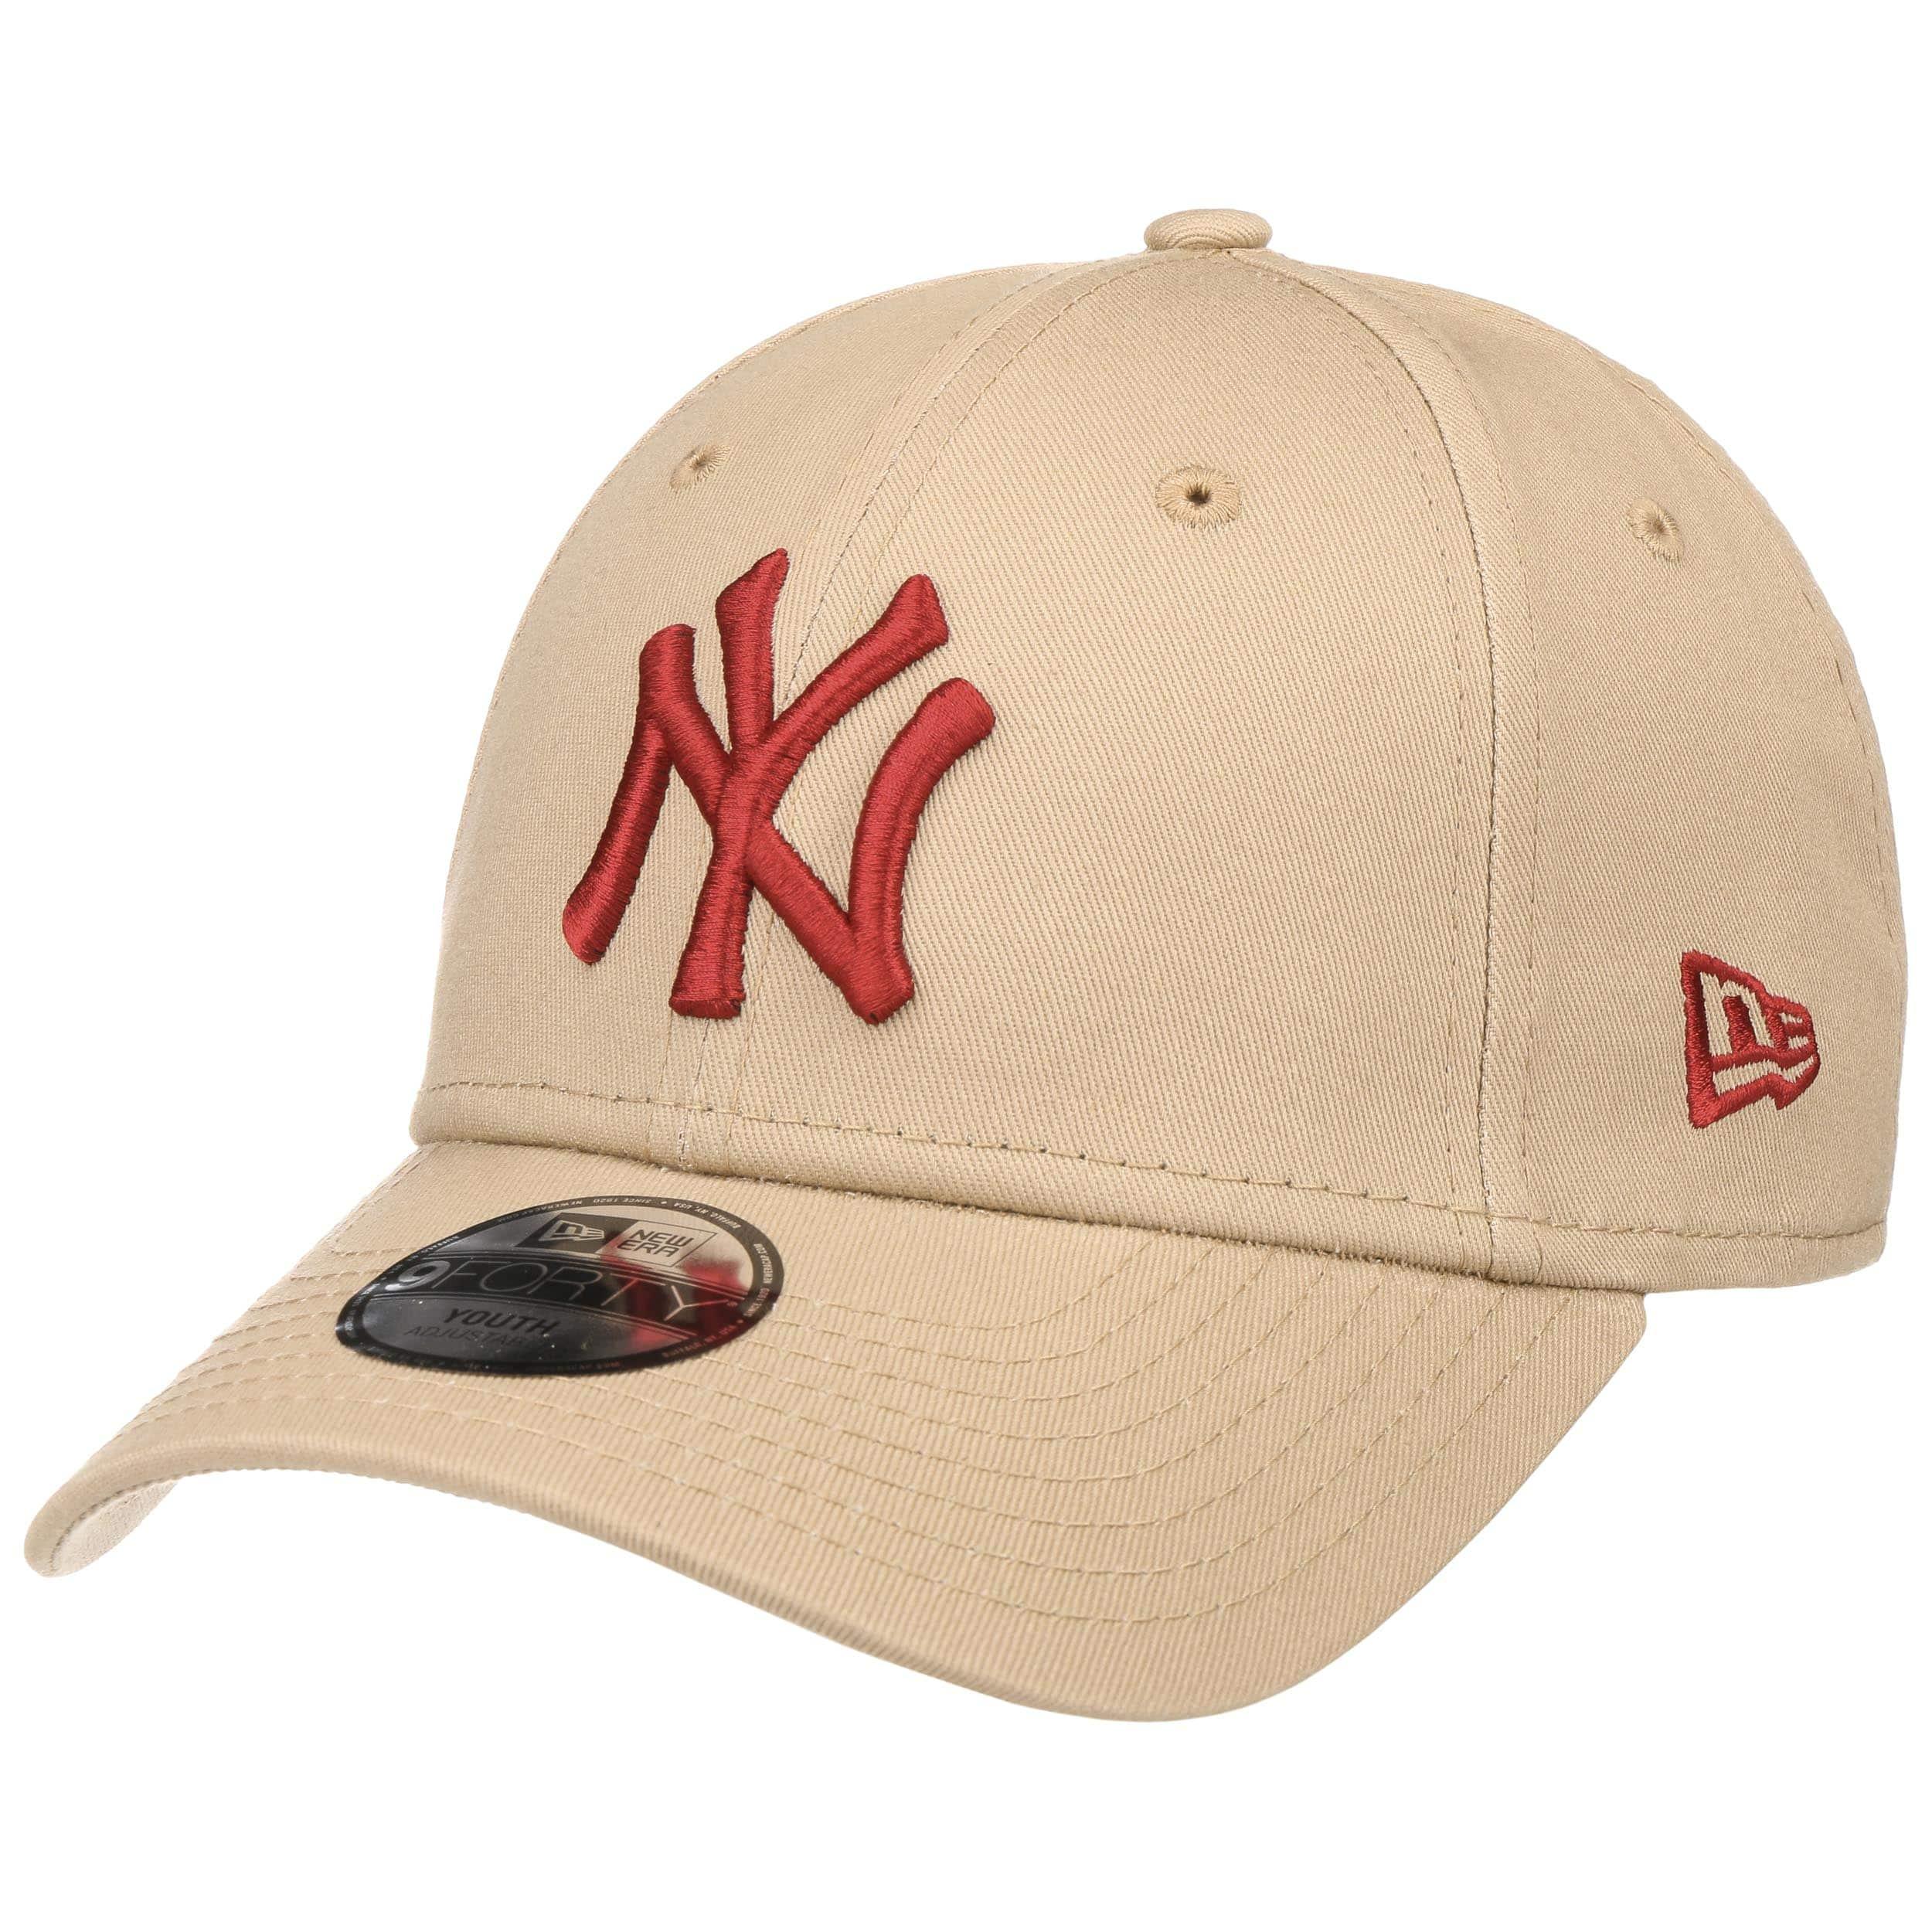 ... oliva 2 · Cappellino da Bambino 9Forty League NY by New Era - beige 1  ... 4ac782aed2f0